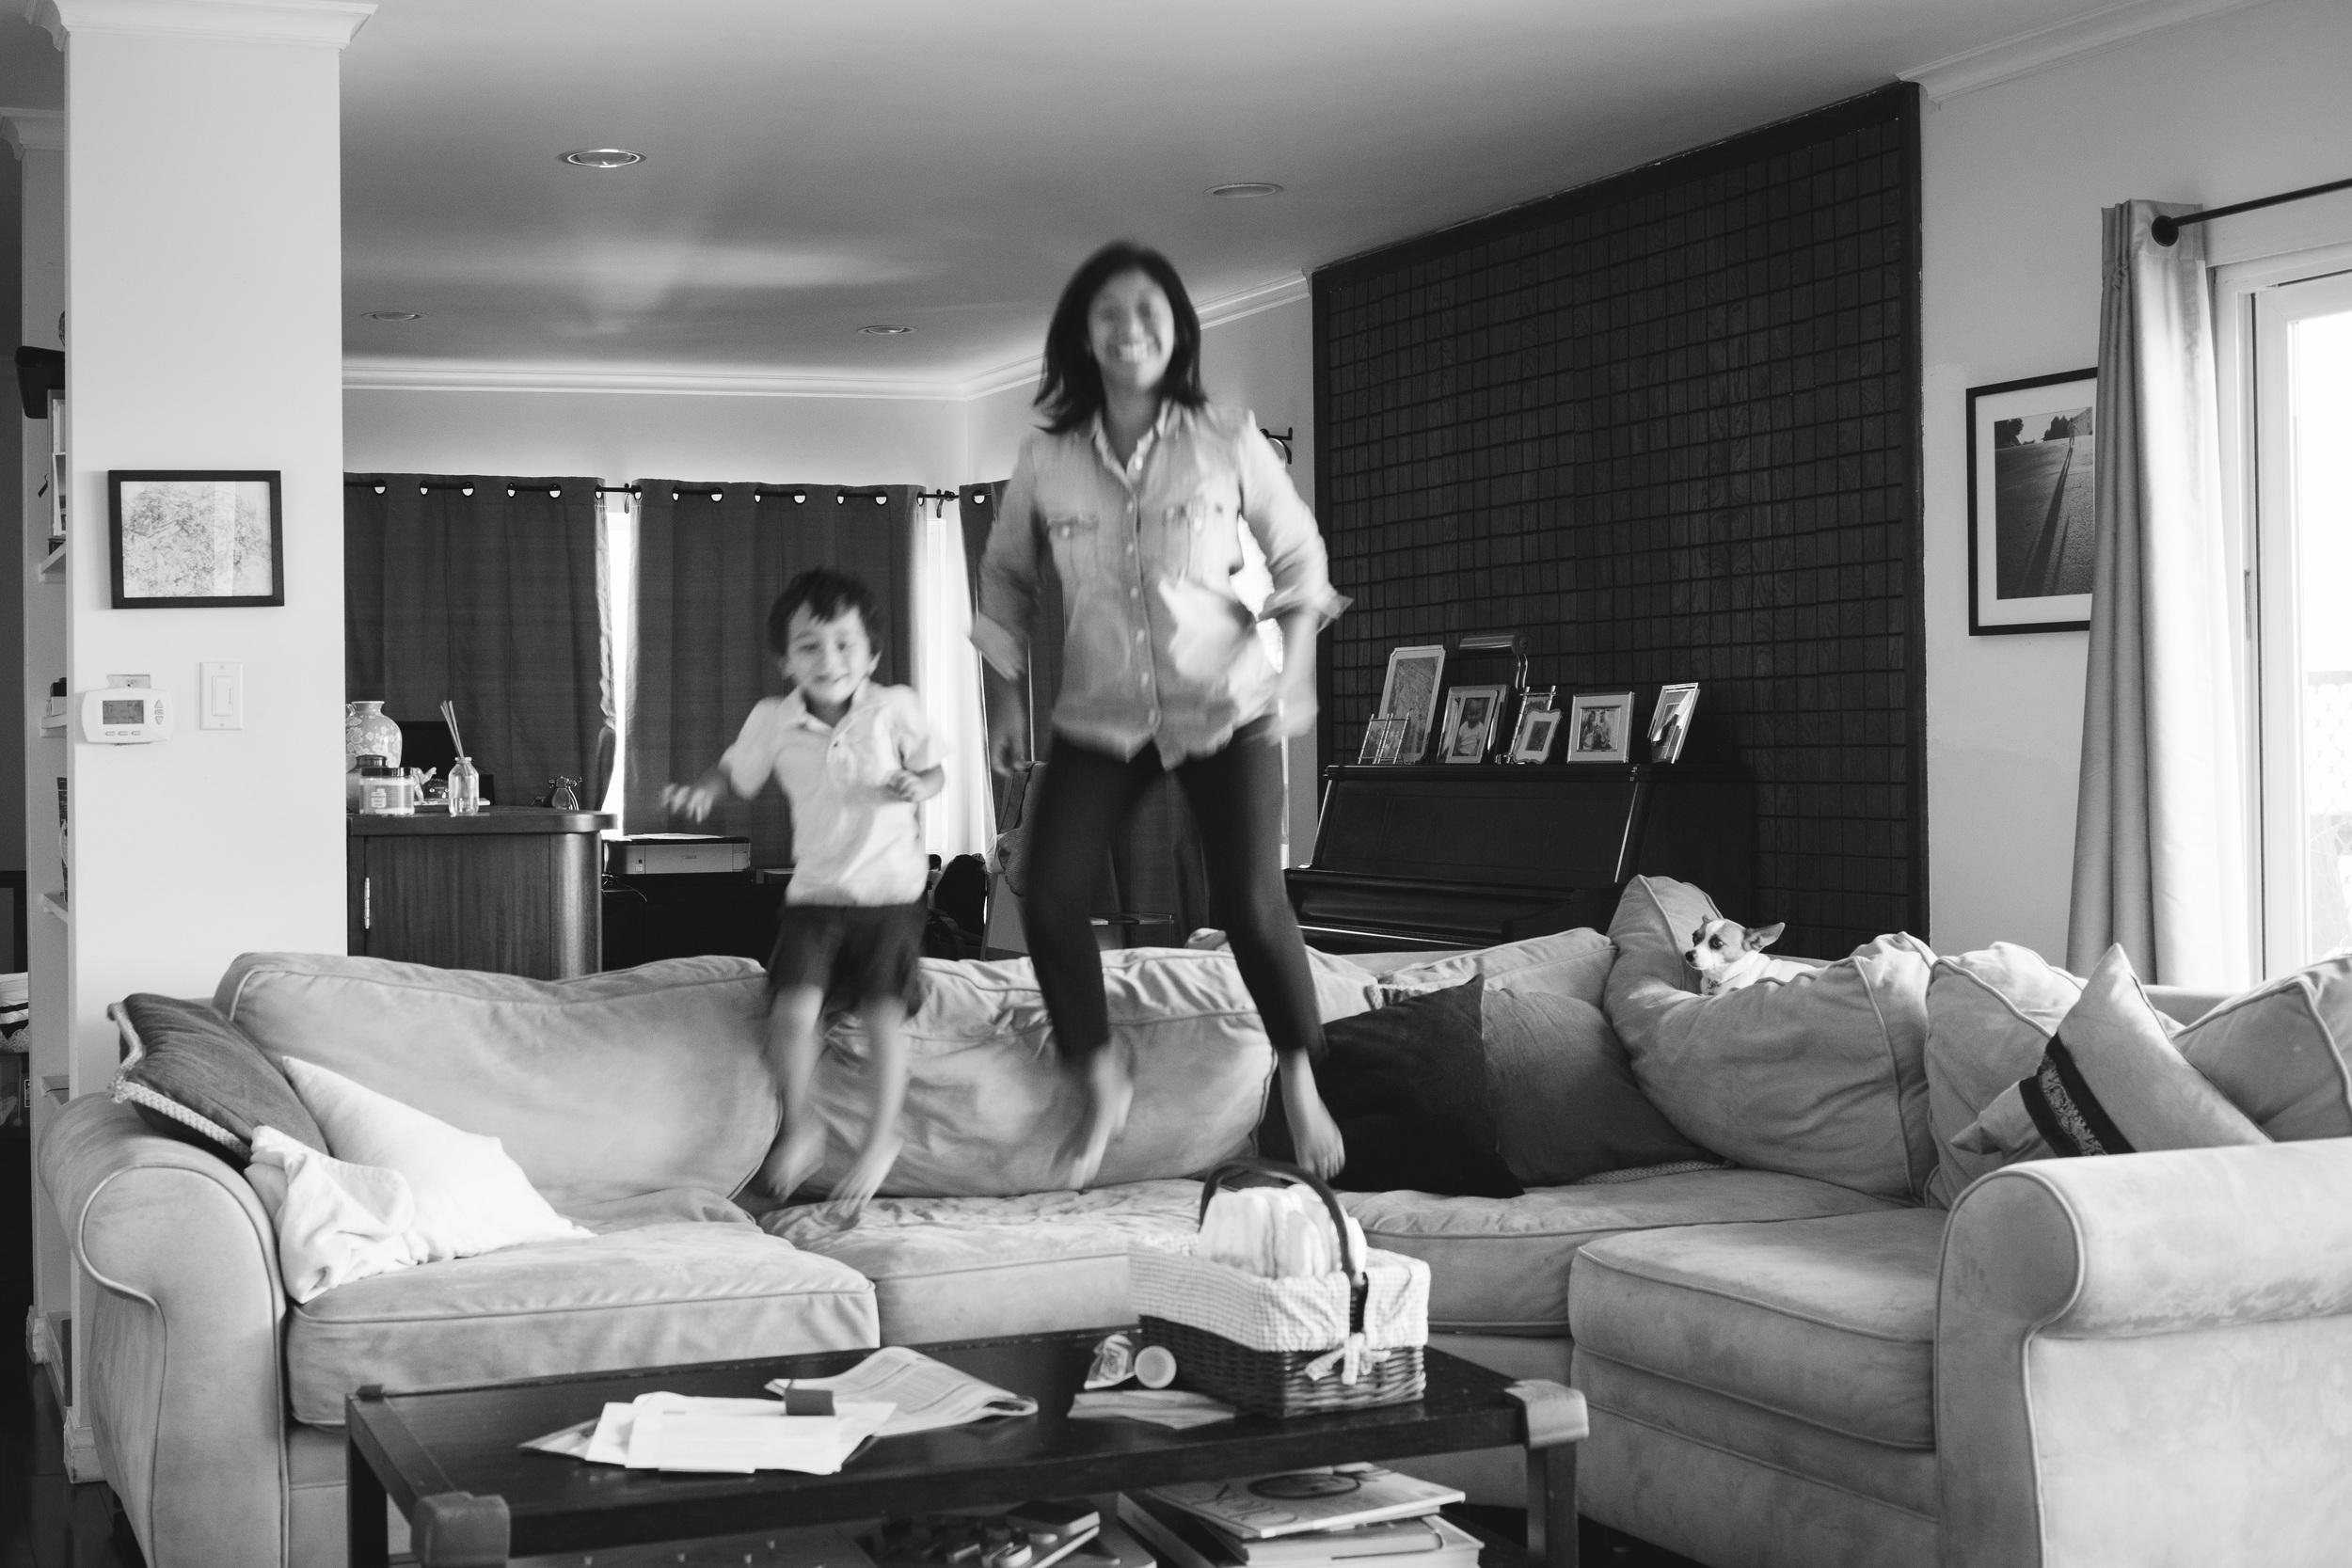 jump couch-1.JPG